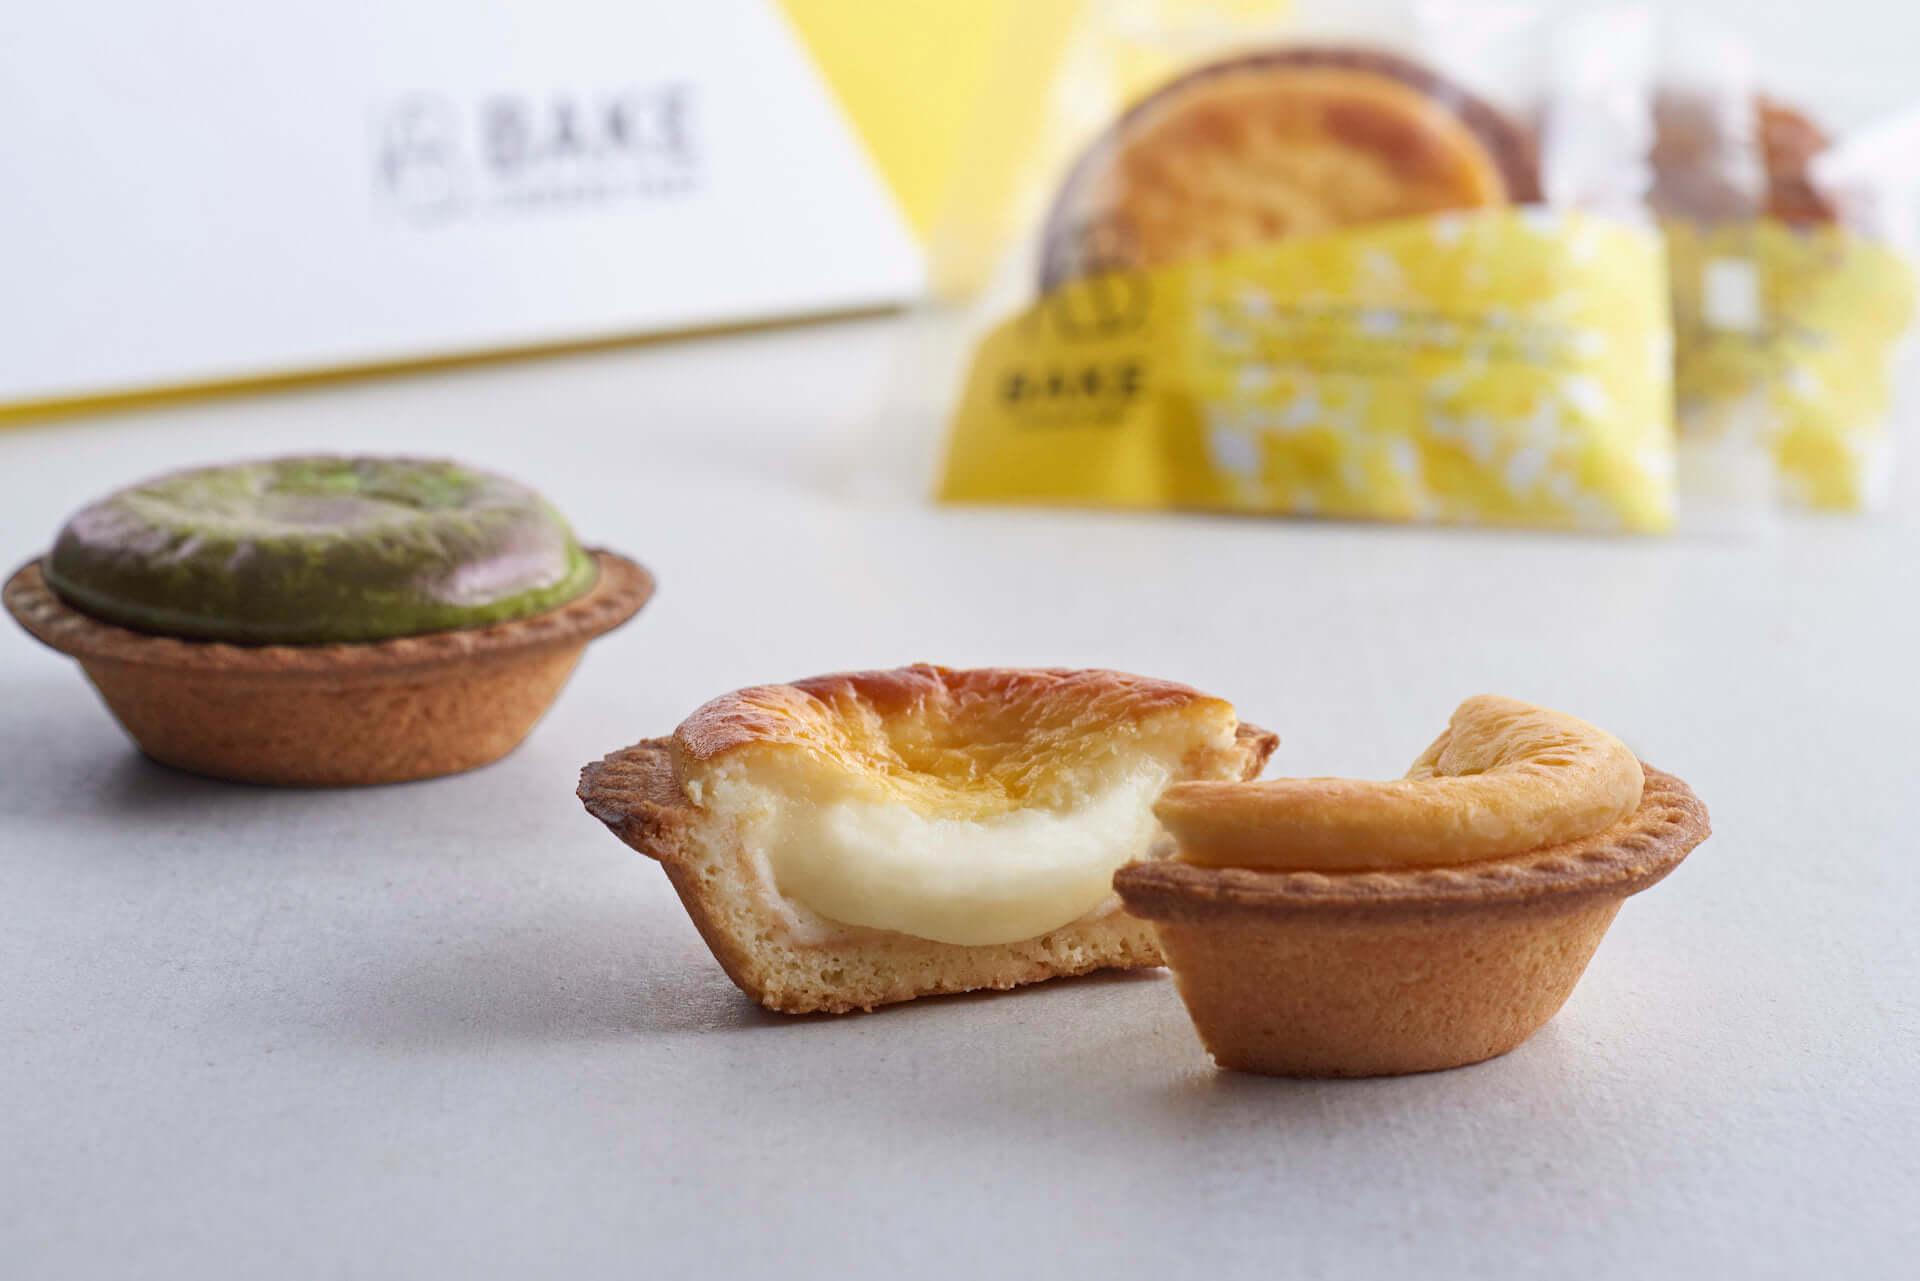 BAKE初の公式オンラインショップ「BAKE THE ONLINE」がオープン!チーズタルト10P BOXが50%OFFの特別価格に gourmet_bake_online_05-1920x1281